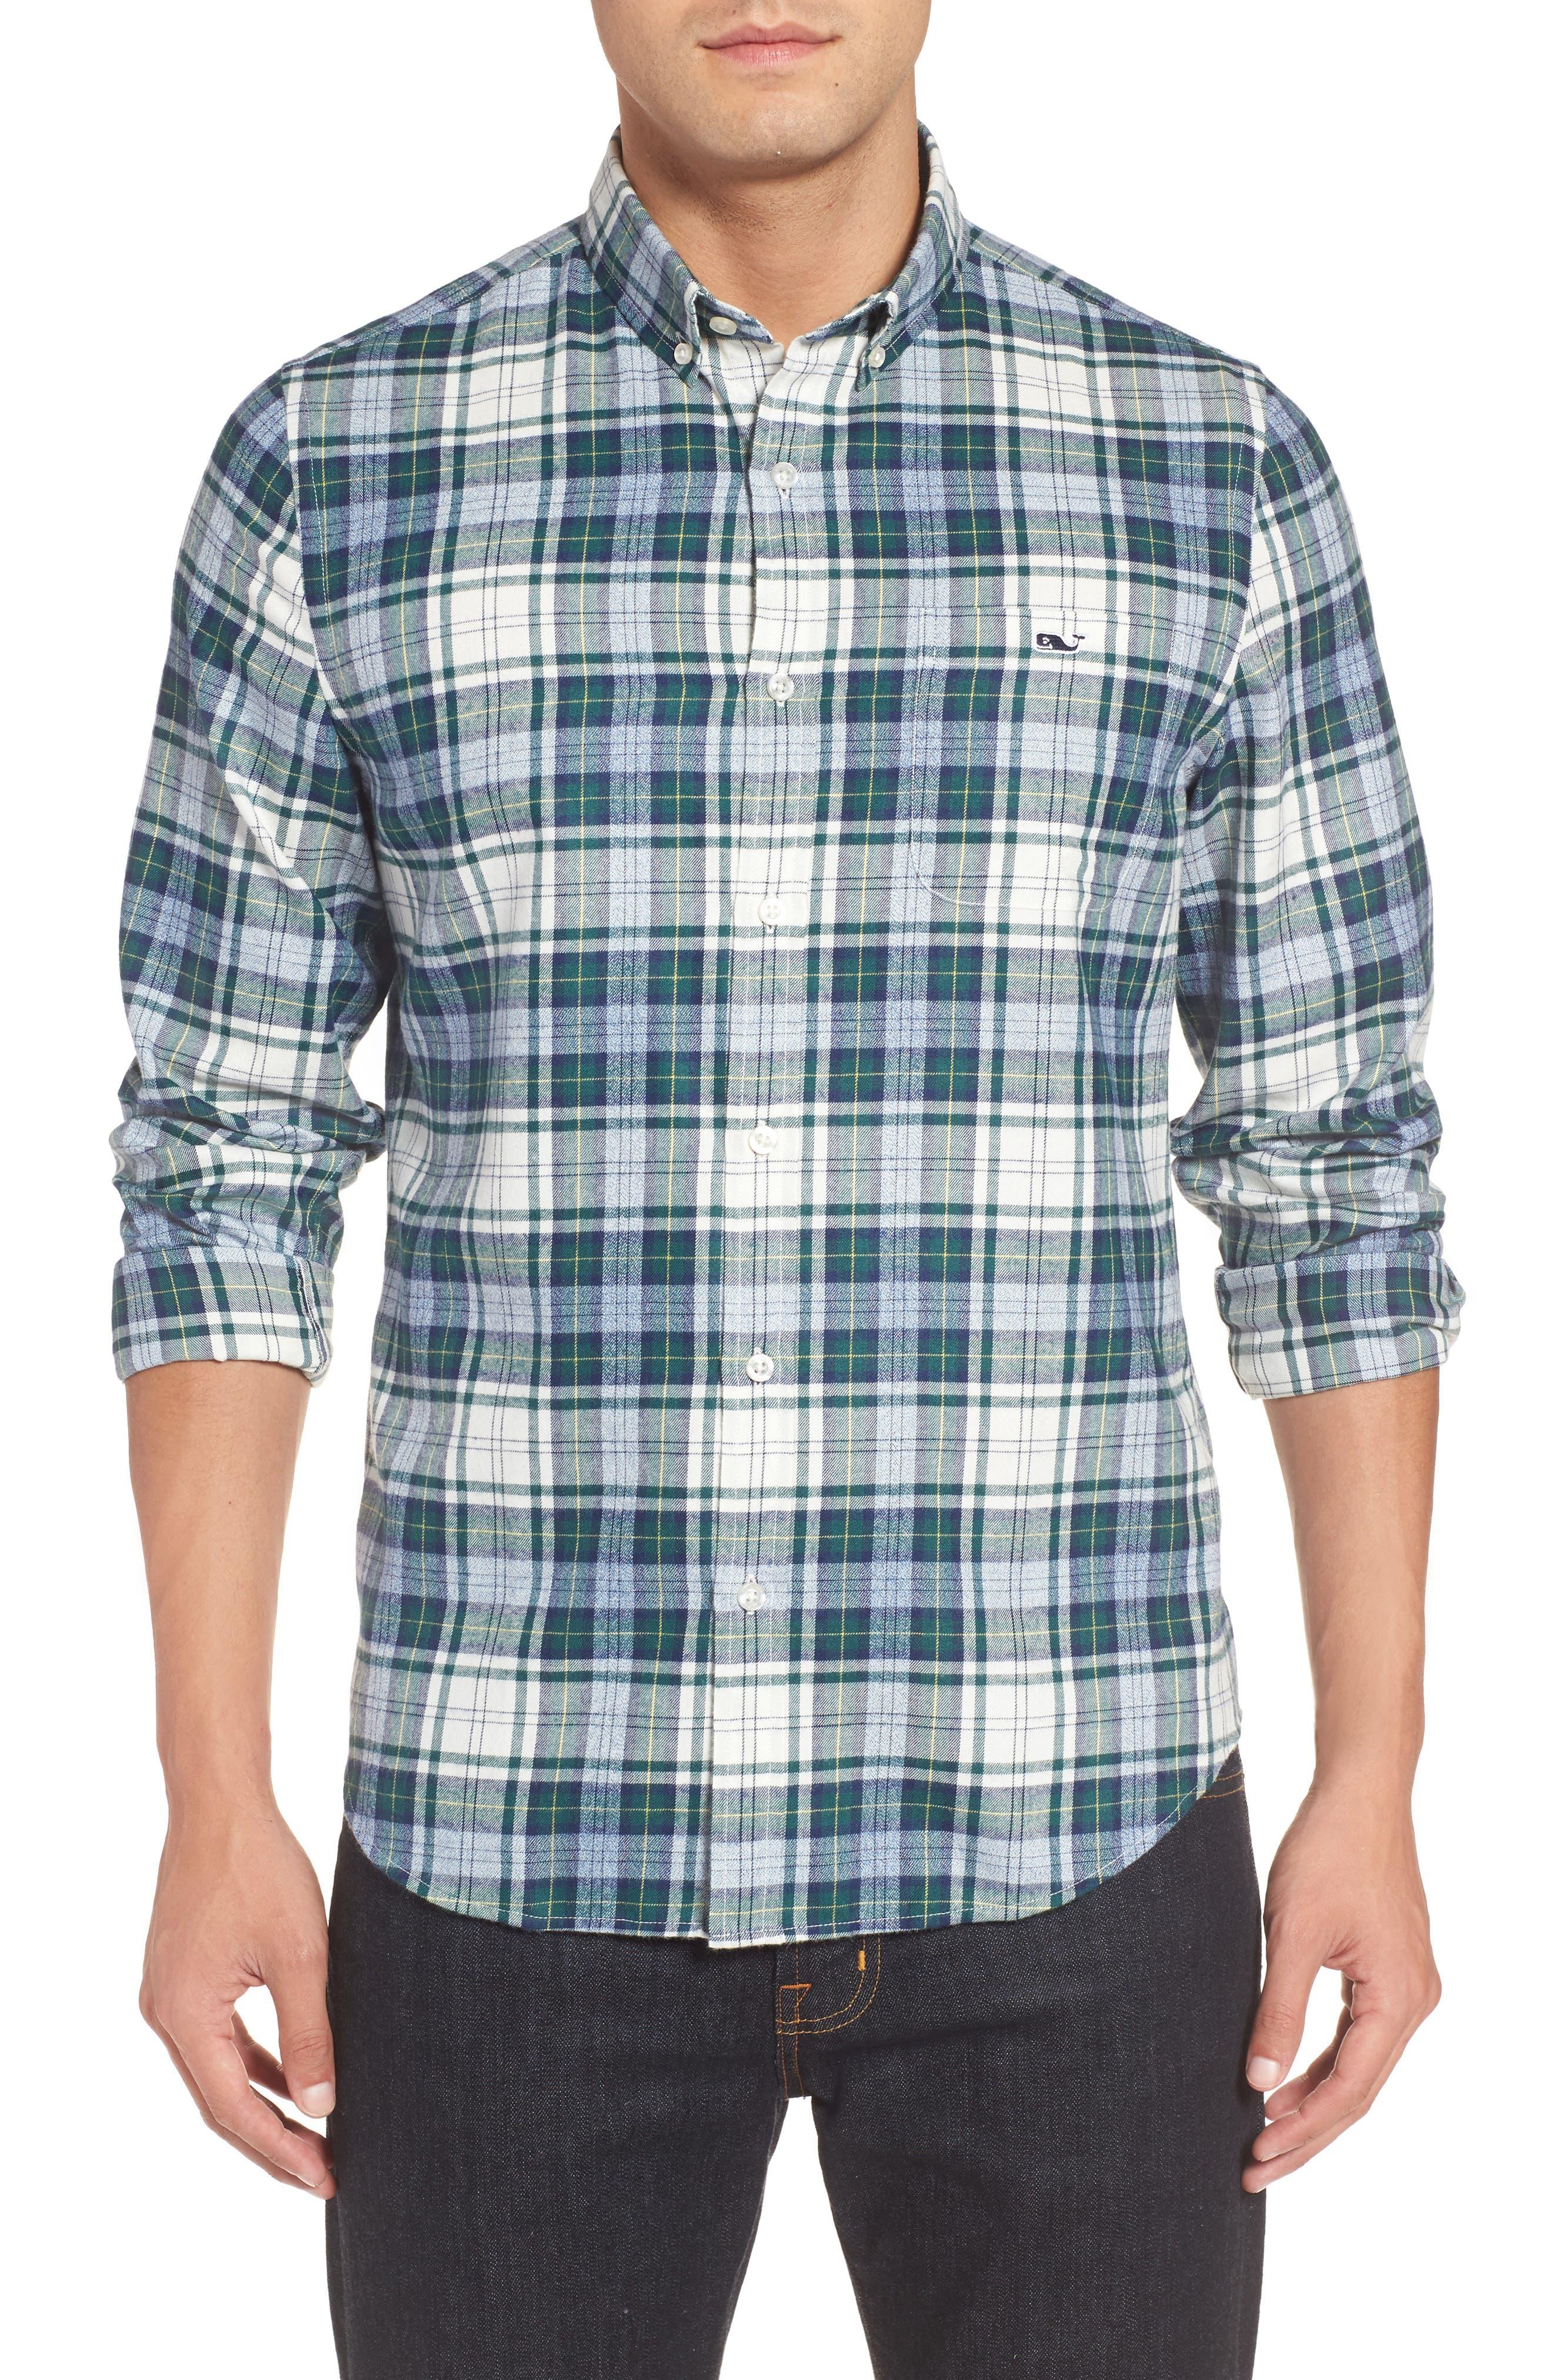 Tucker Hayward Point Slim Fit Plaid Sport Shirt,                         Main,                         color, Charleston Green